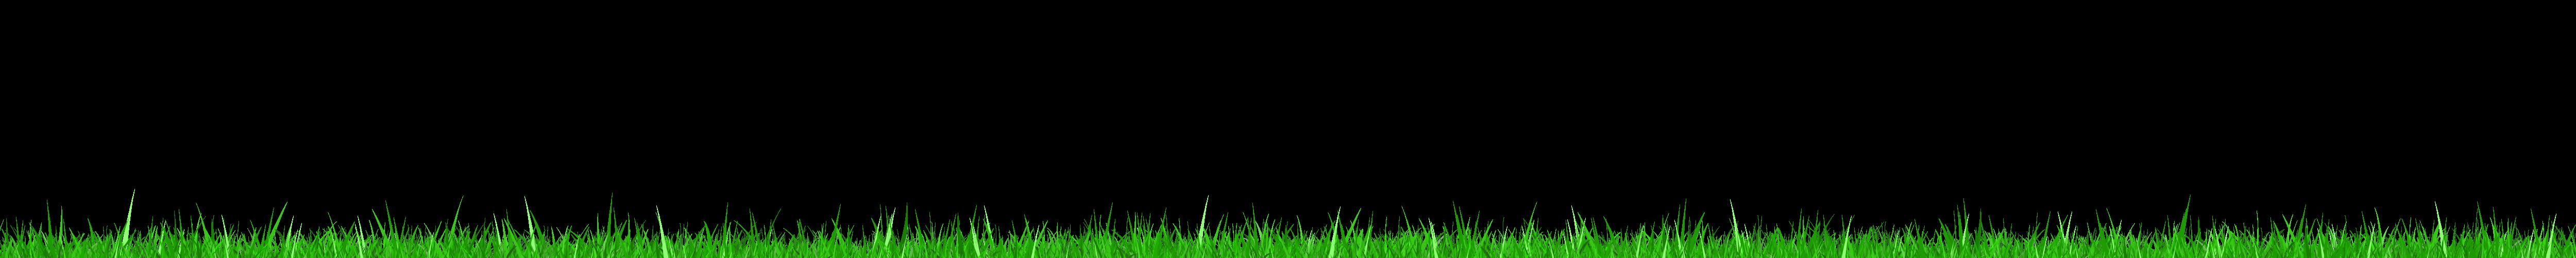 Grass Background (PSD, PNG) | OnlyGFX.com